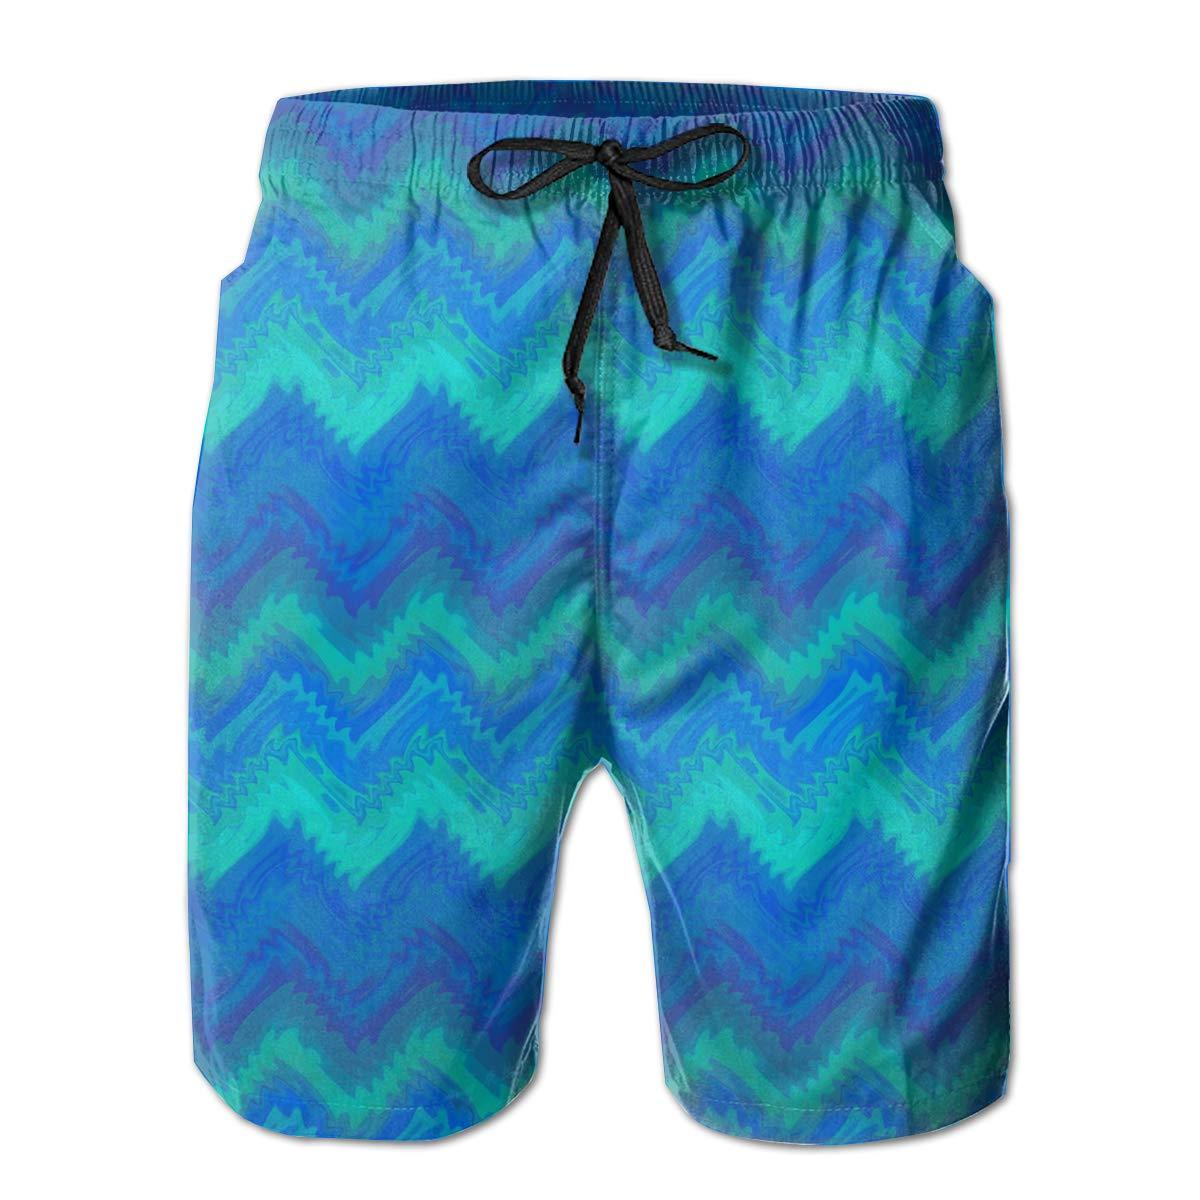 Blue/_Flame/_Chevron Mens Swim Trunks Bathing Suit Shorts Board Beach